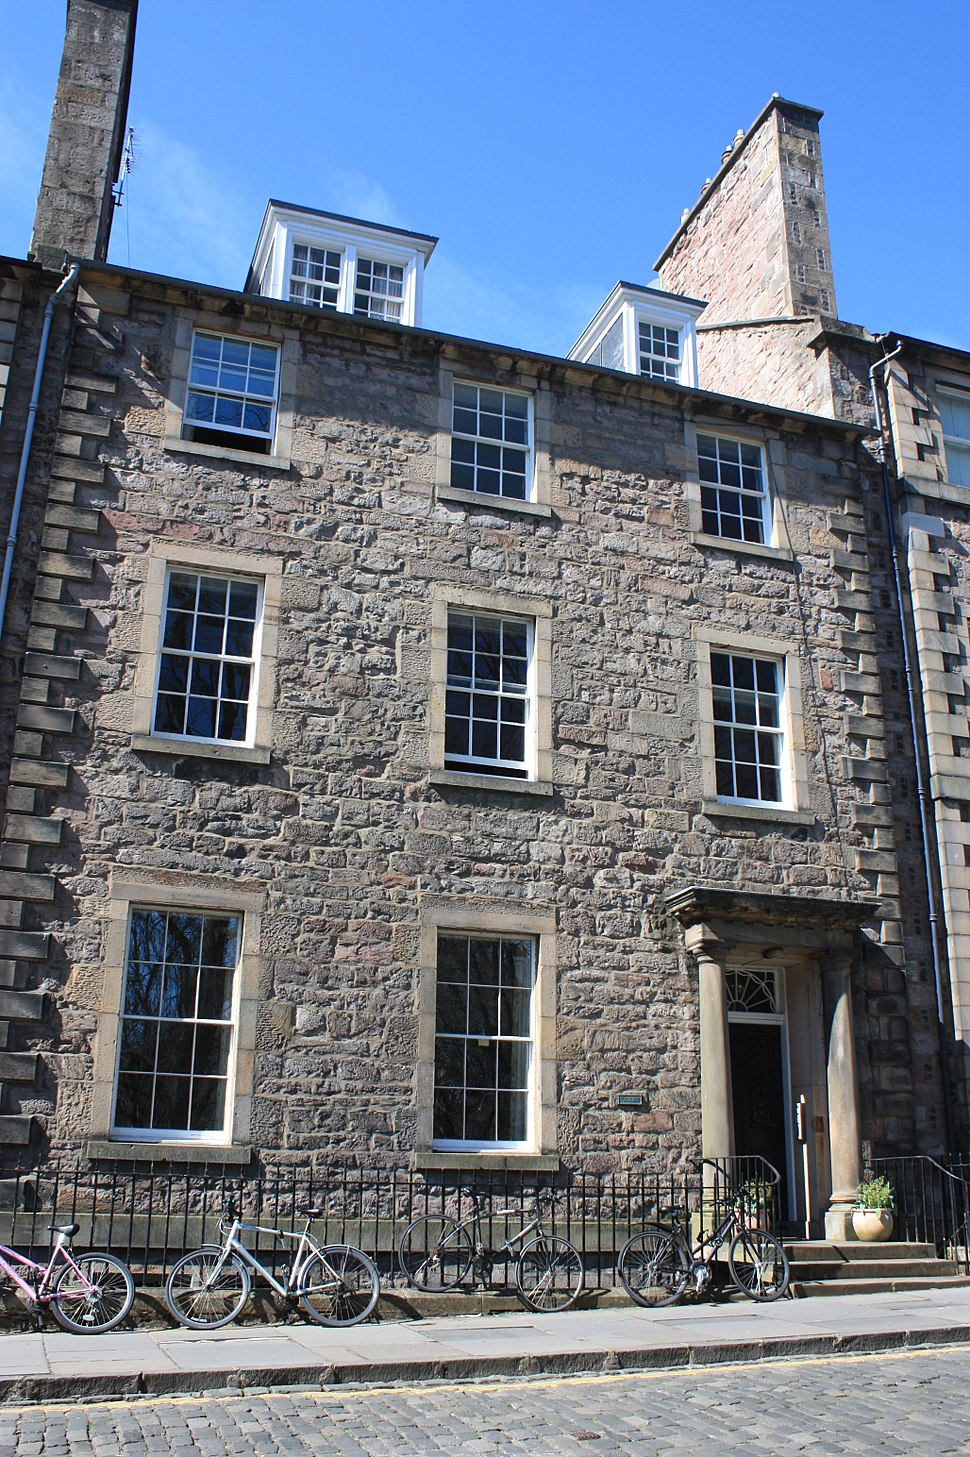 The Scott's family home in George Square, Edinburgh